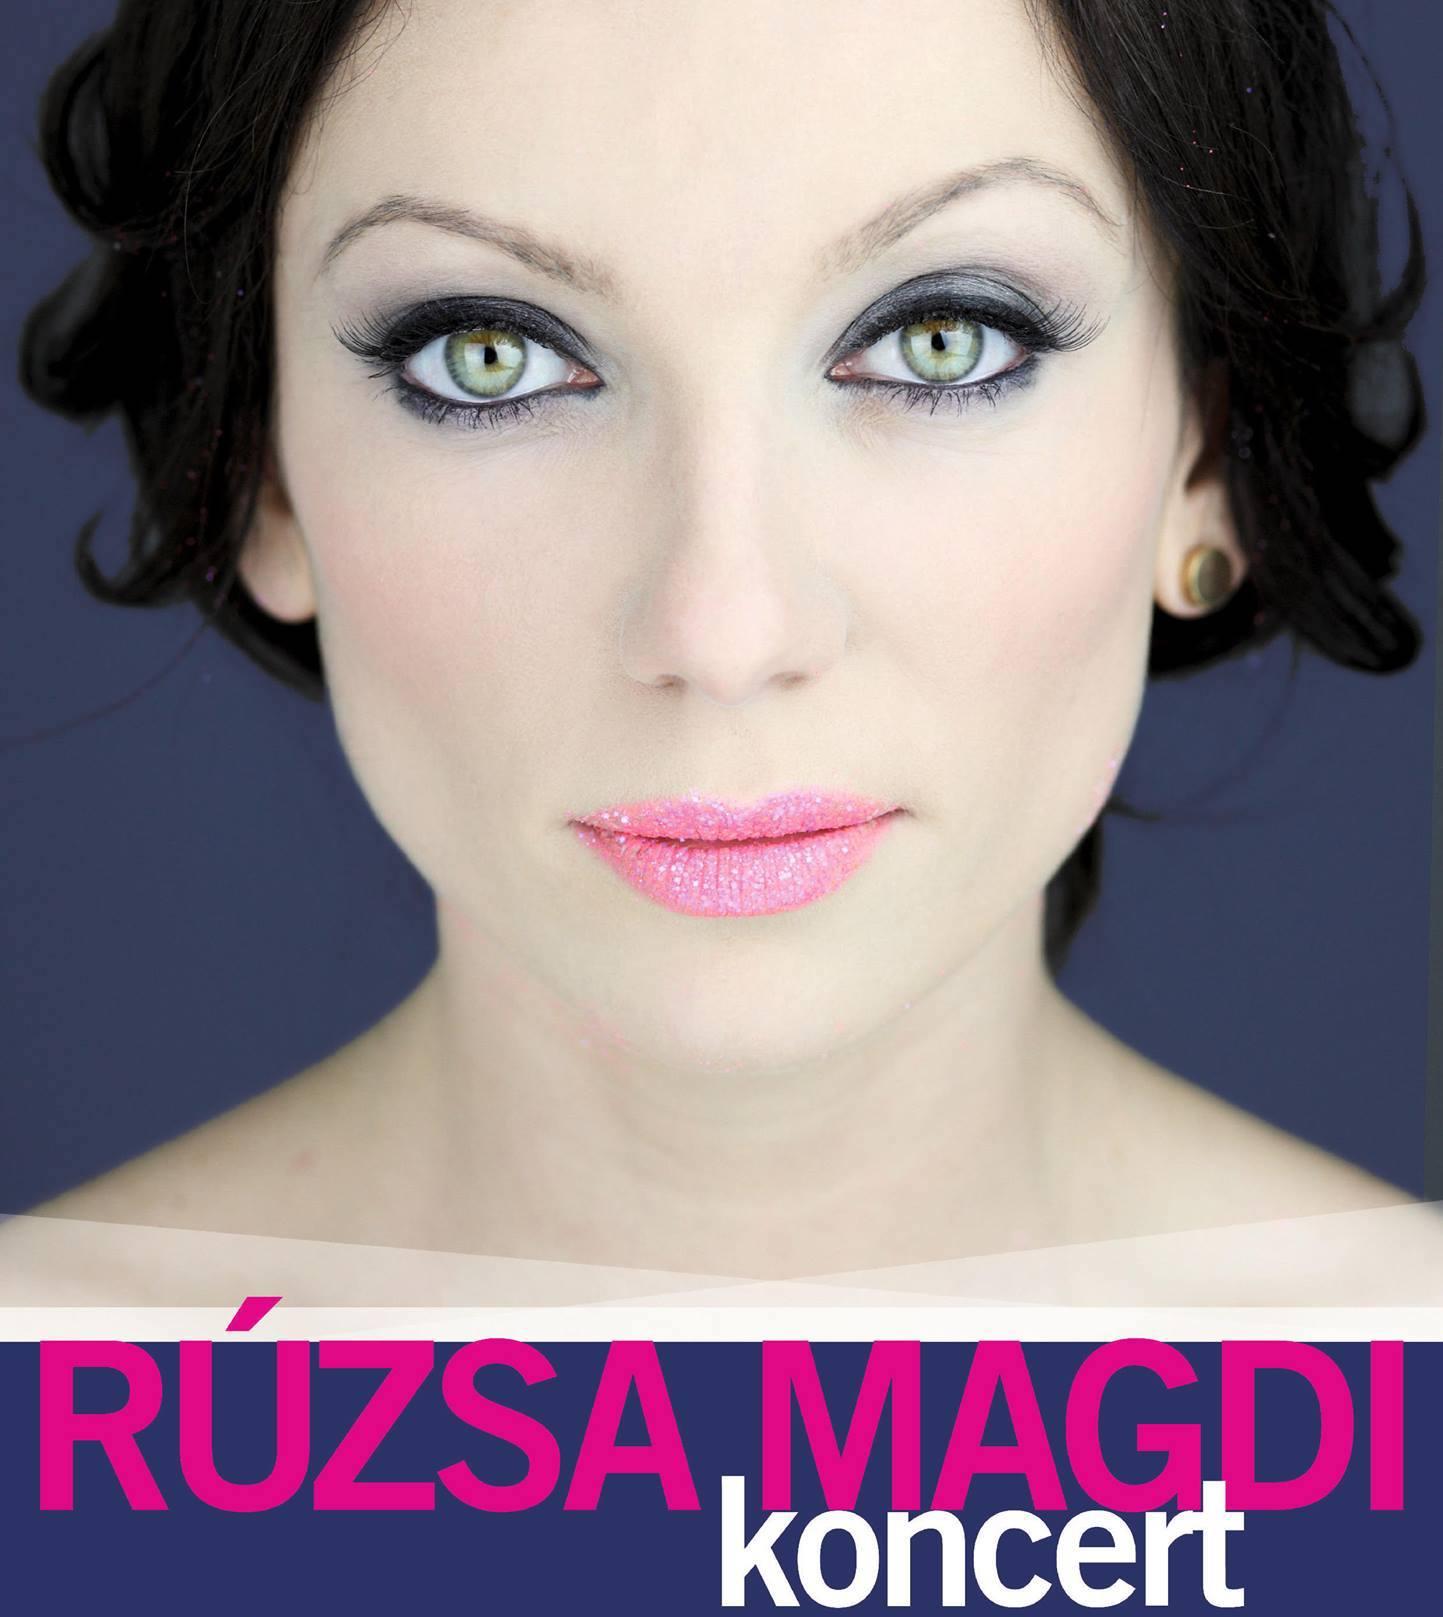 Rúzsa Magdi koncert 2018 - Budapest Aréna